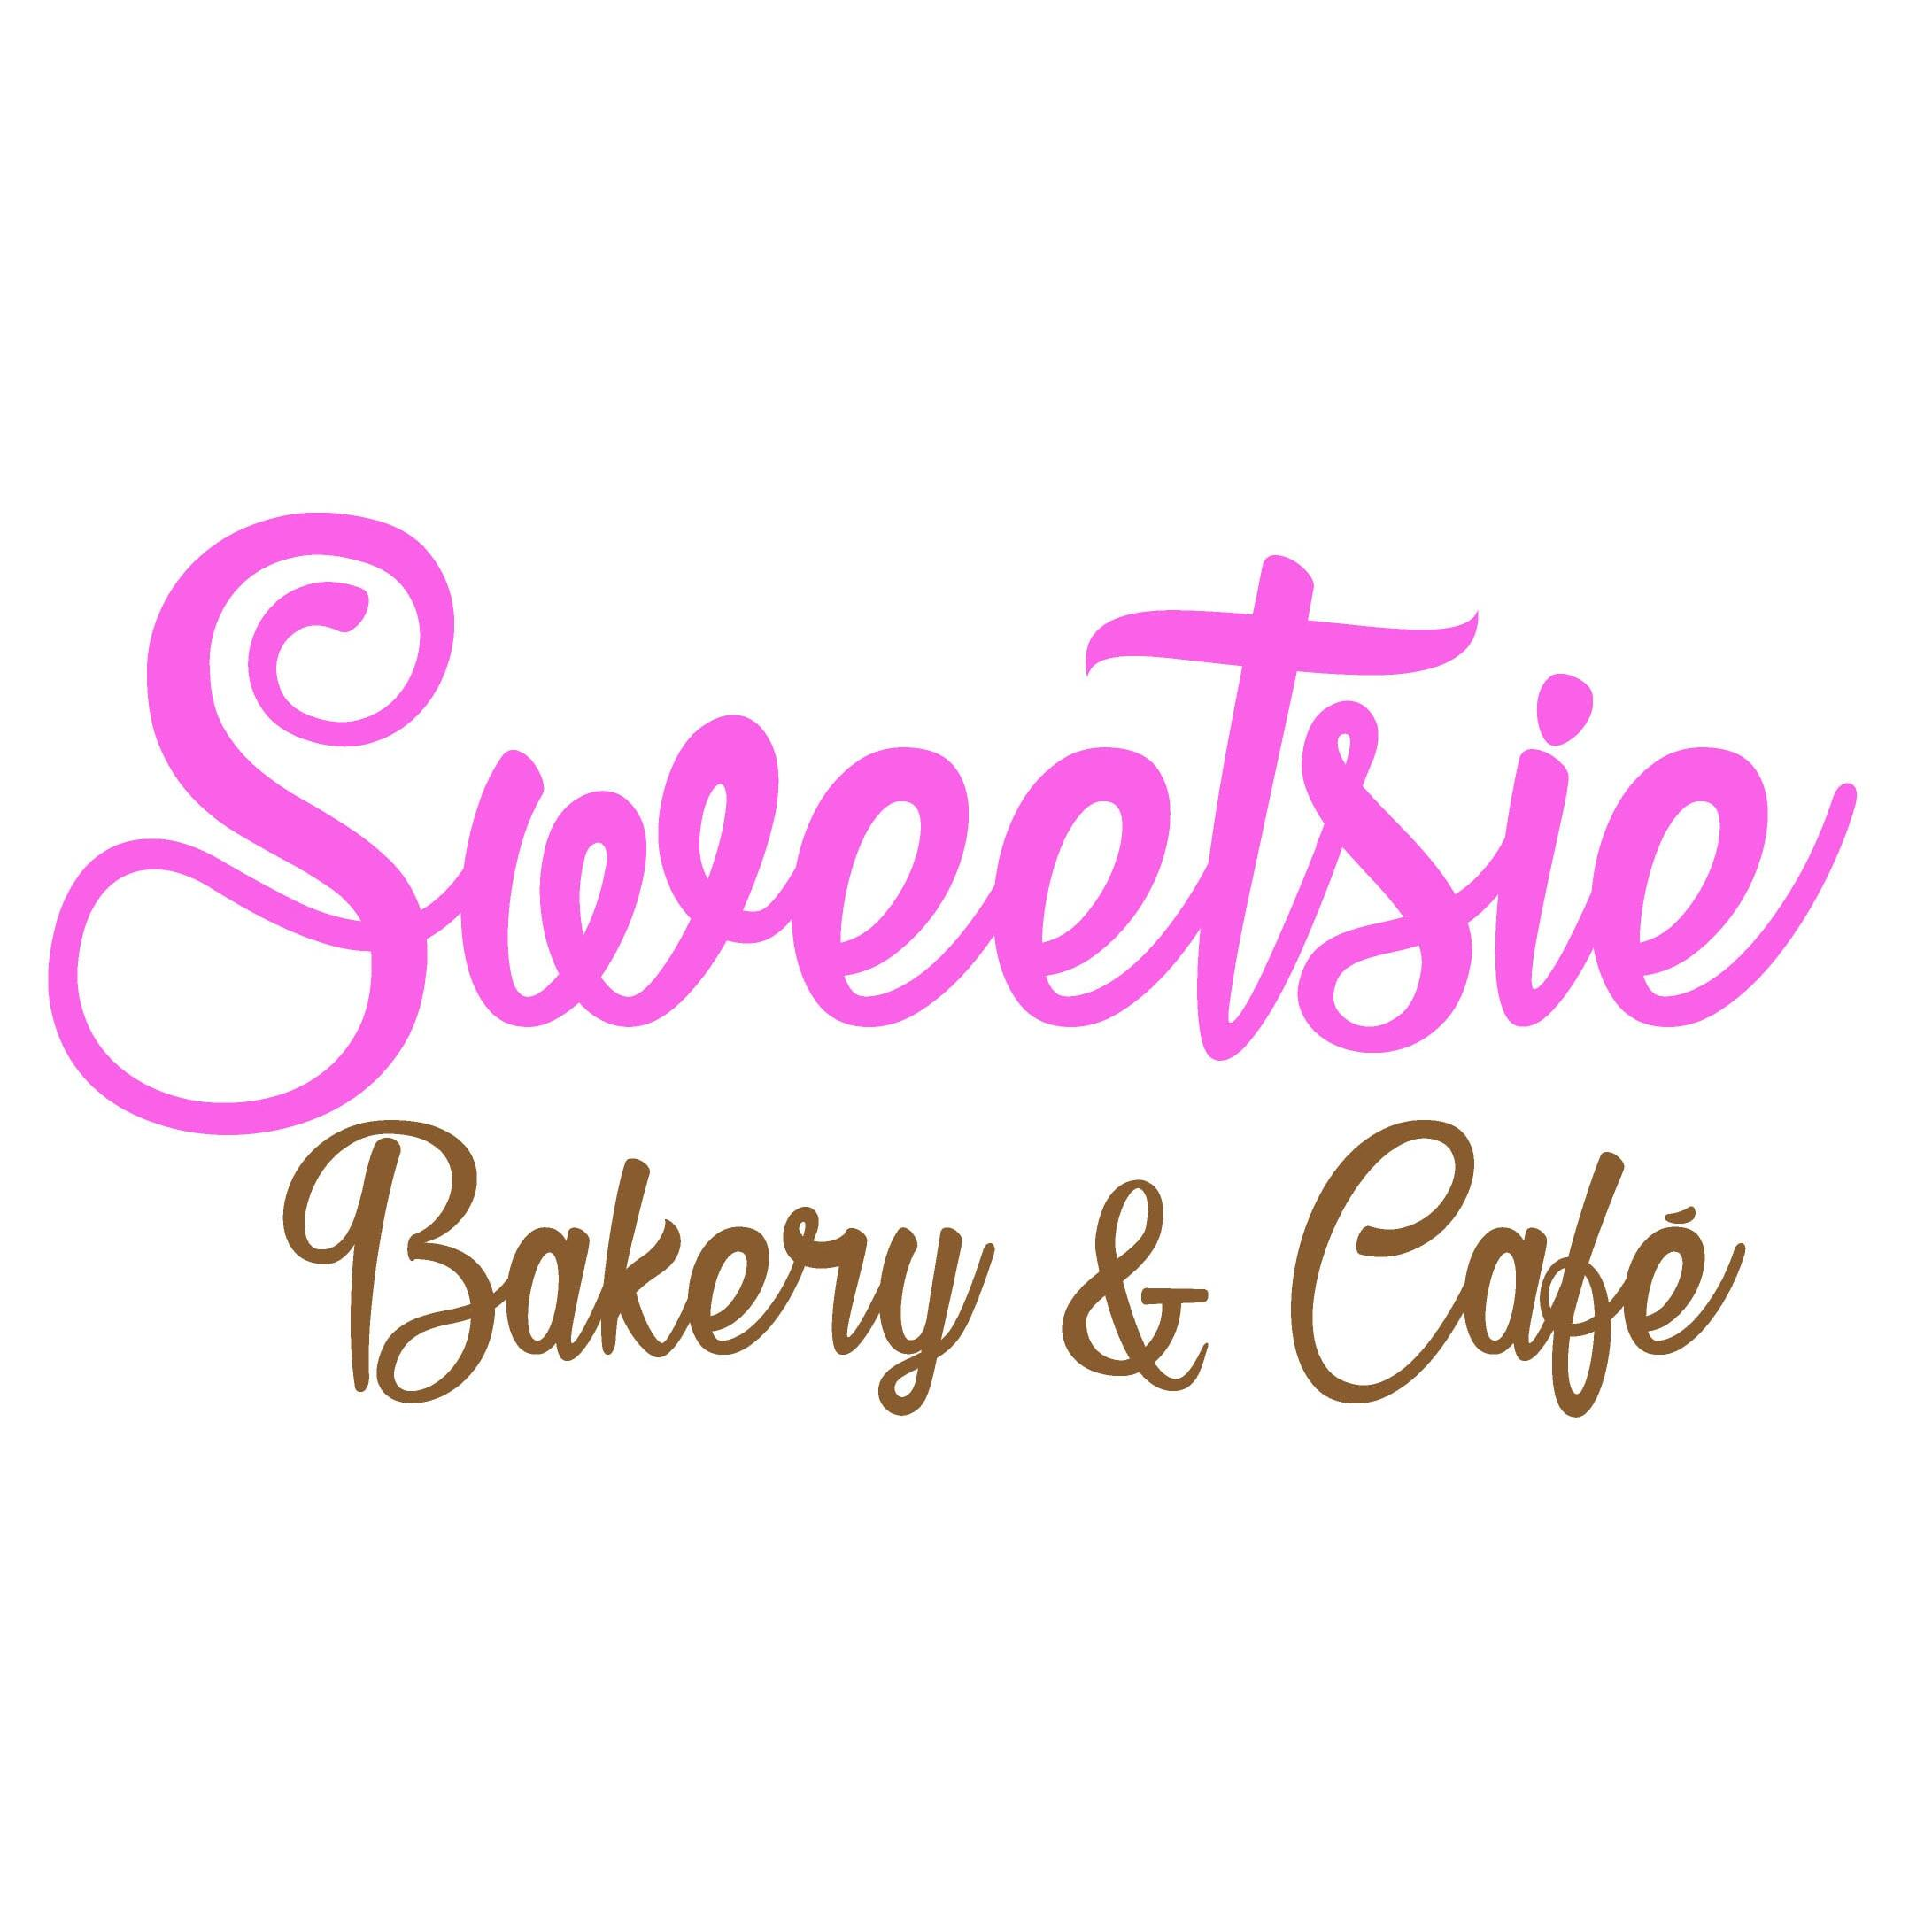 Sweetsie Bakery & Cafe